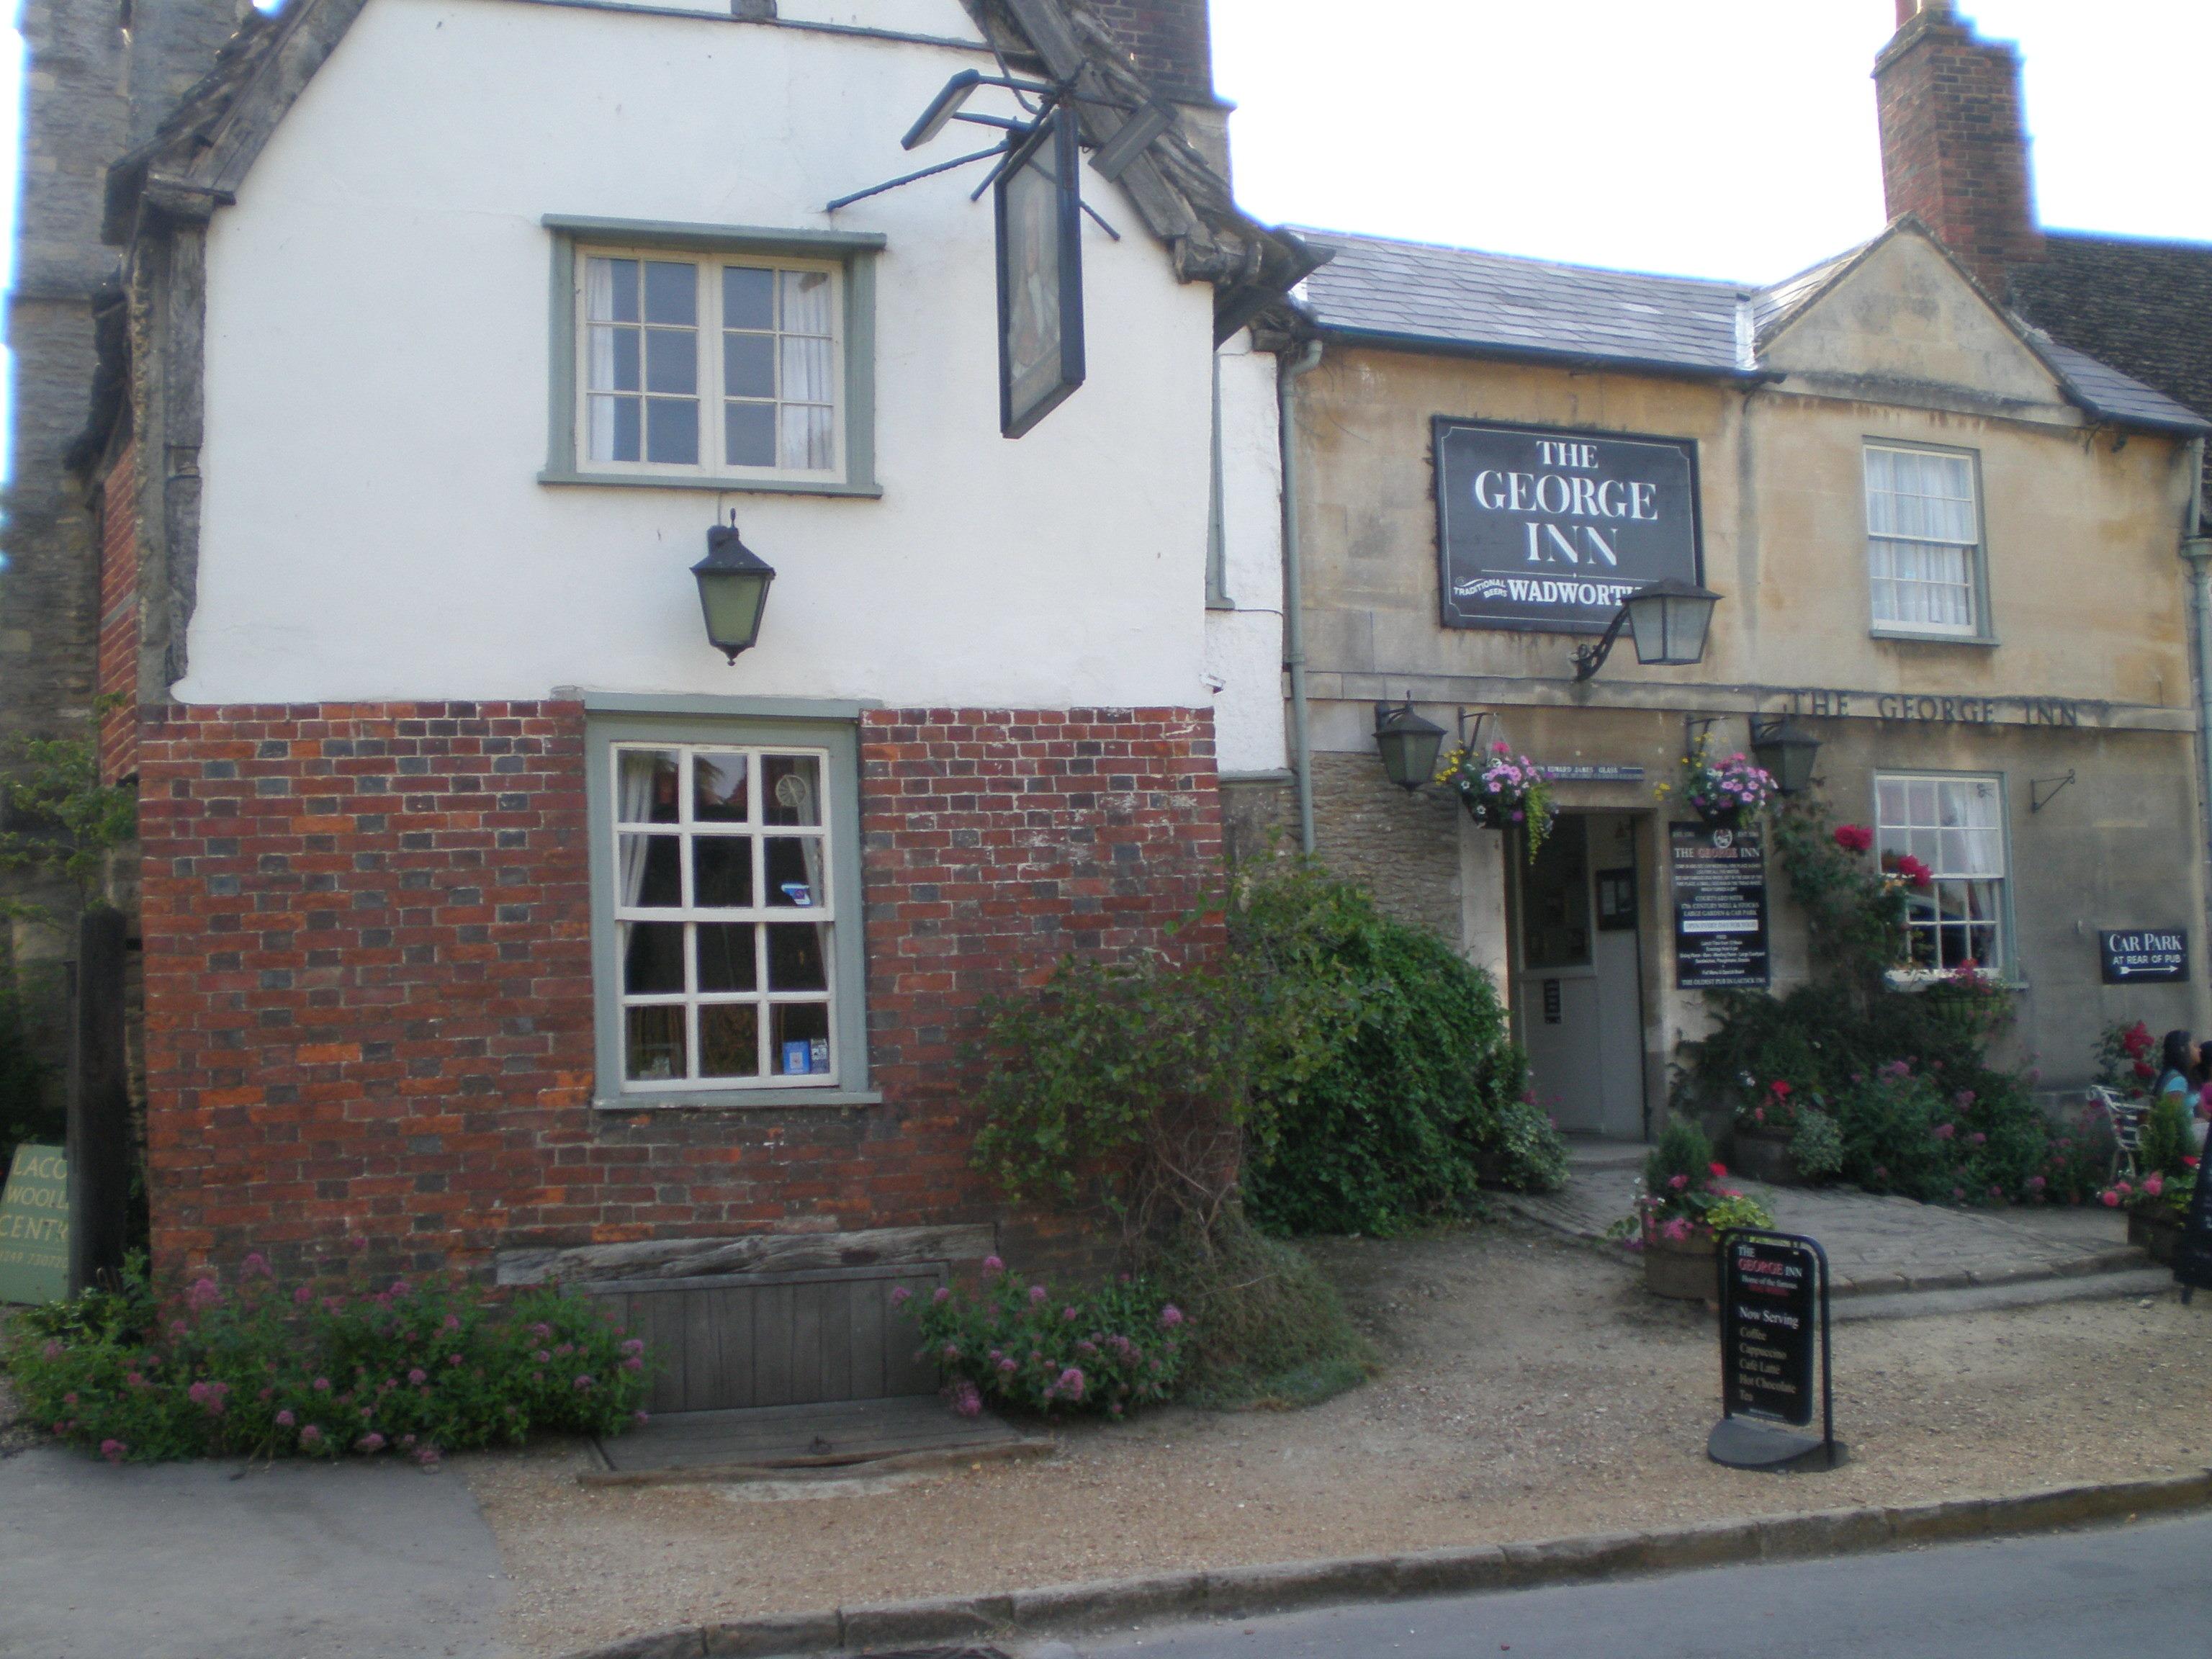 George Inn dates to 1361